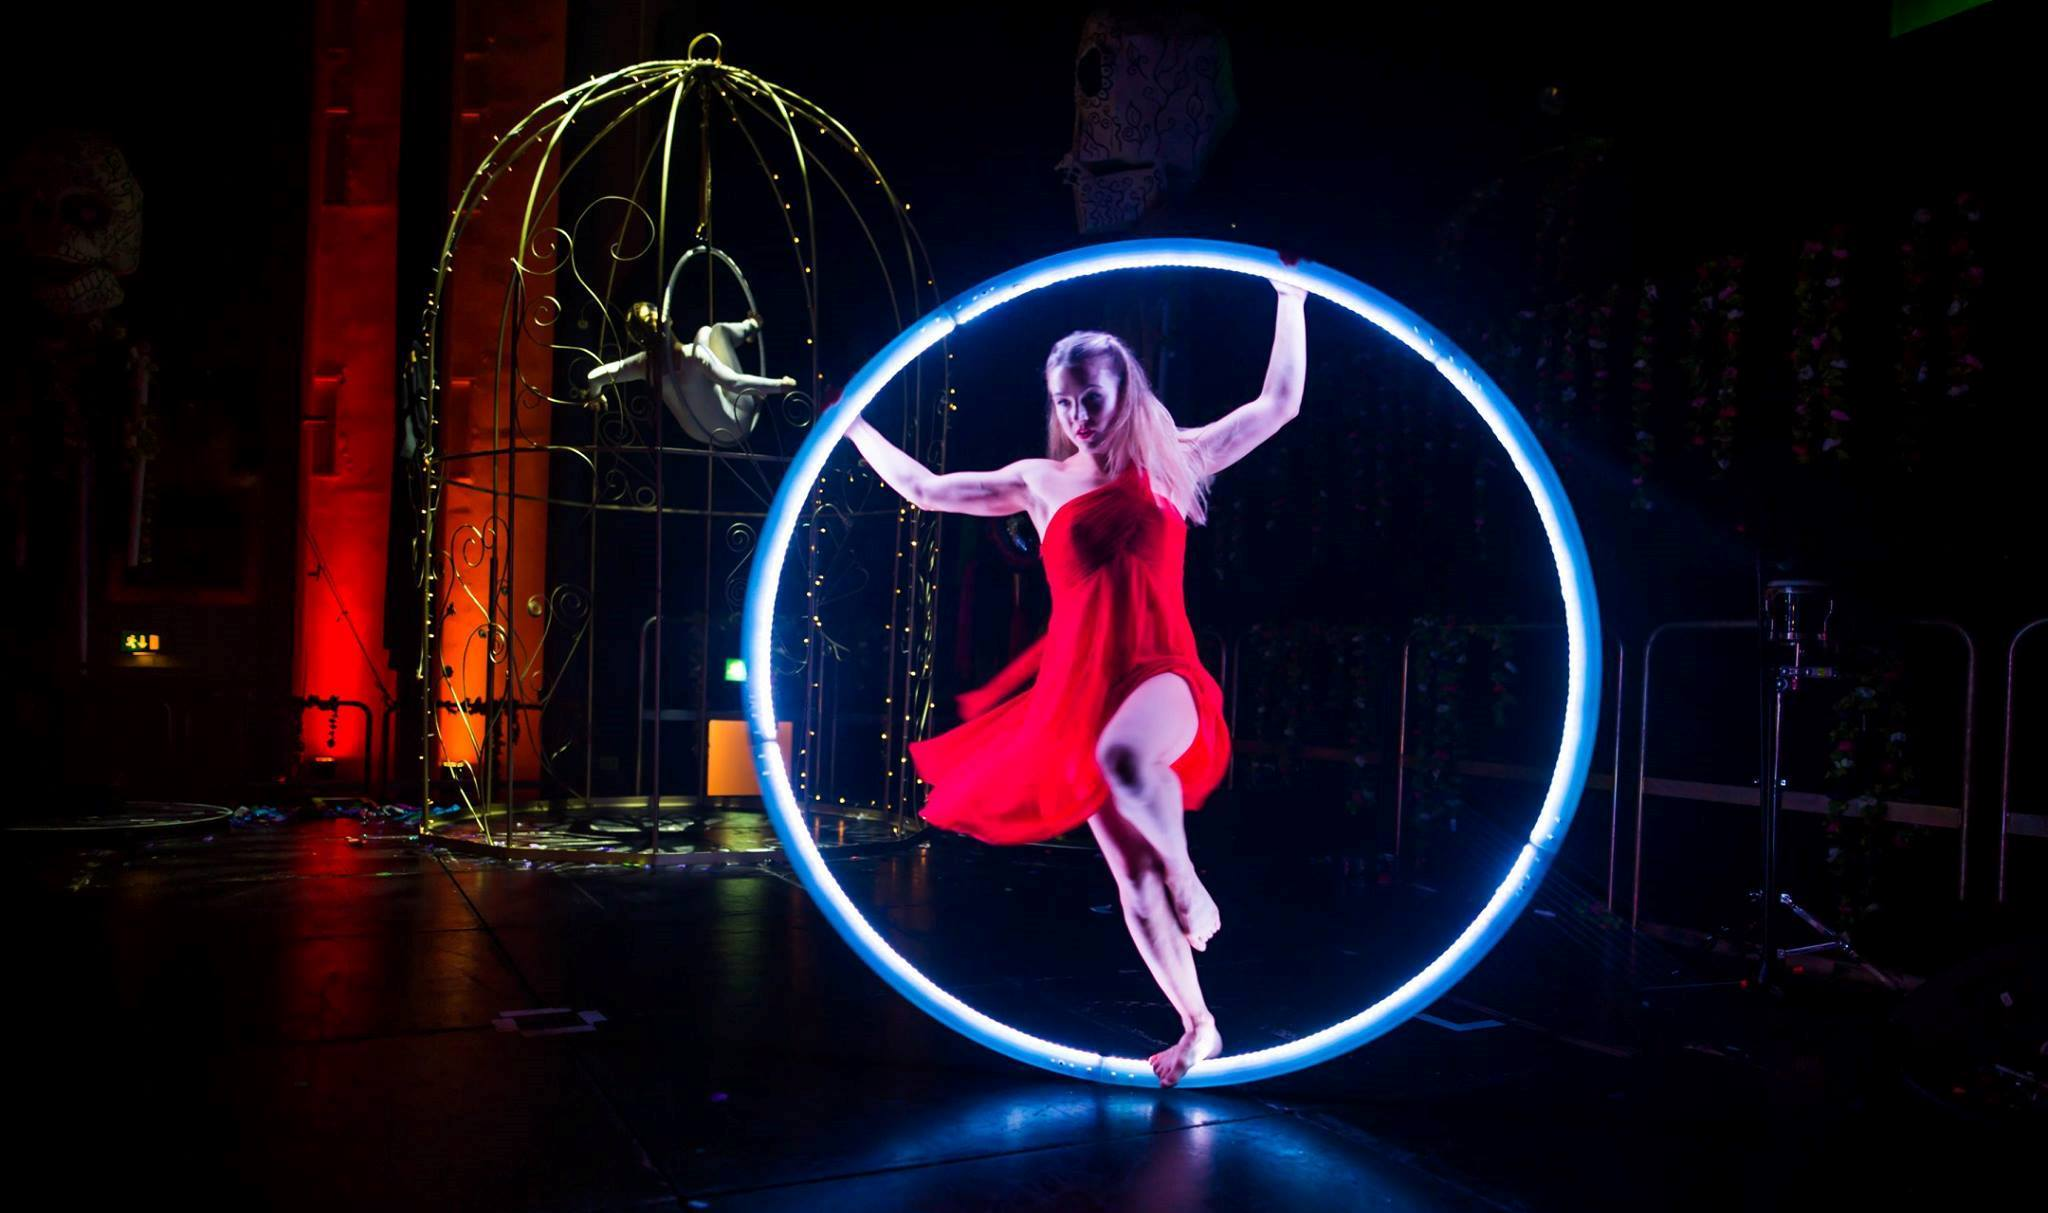 LED cyr wheel act